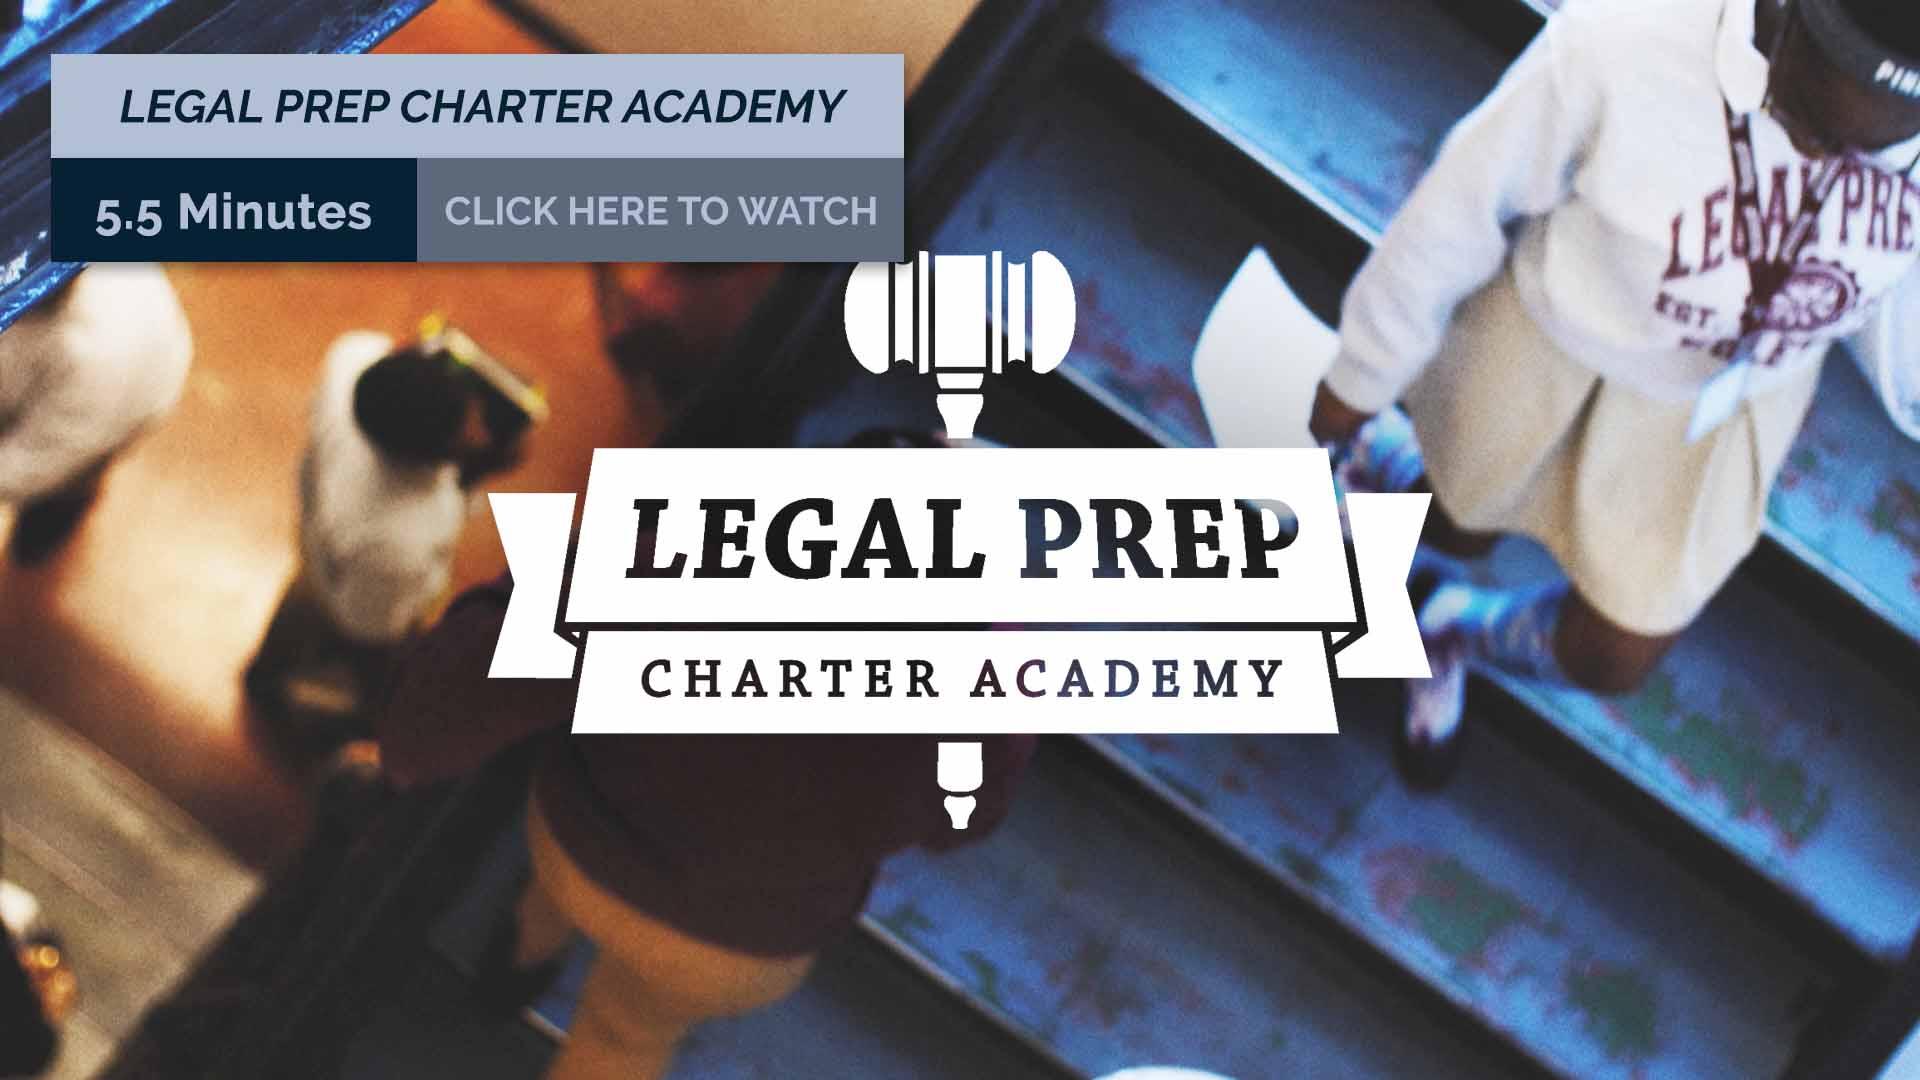 Legal Prep Slideshow Template